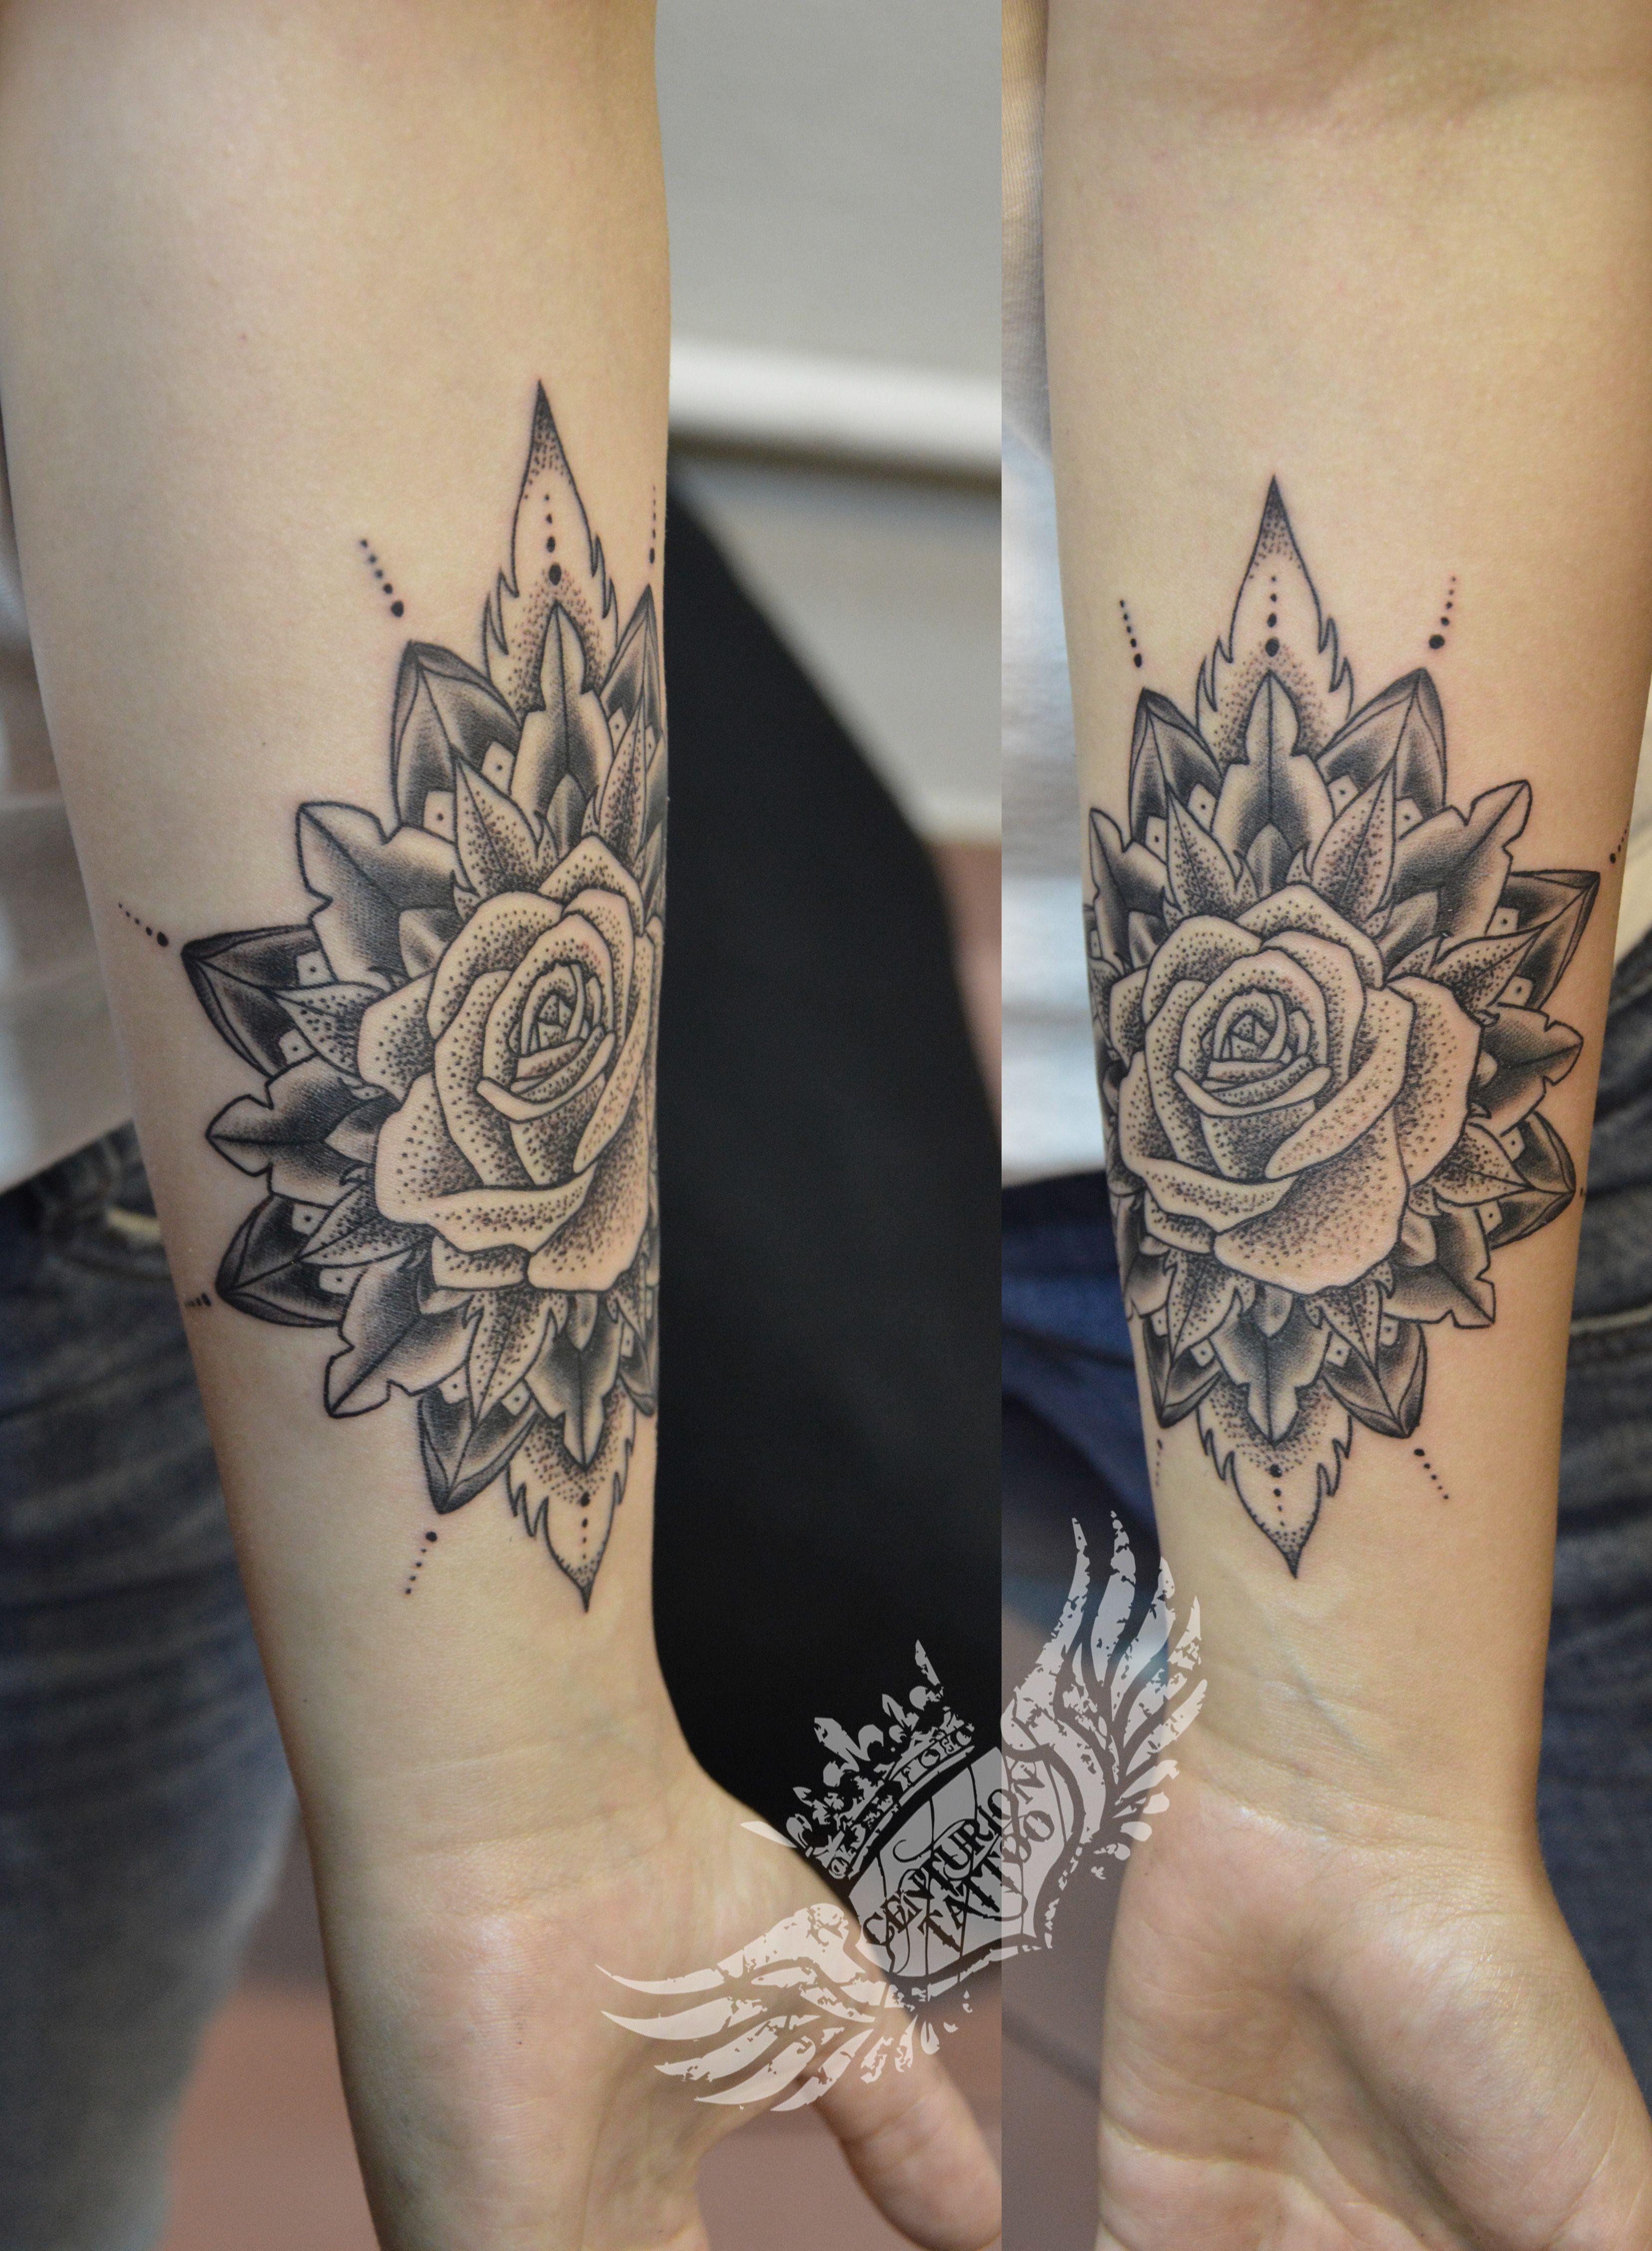 mandala dotwork rose tattoo tattoo centuriontattoo pinterest rose tattoos tattoo and tatting. Black Bedroom Furniture Sets. Home Design Ideas